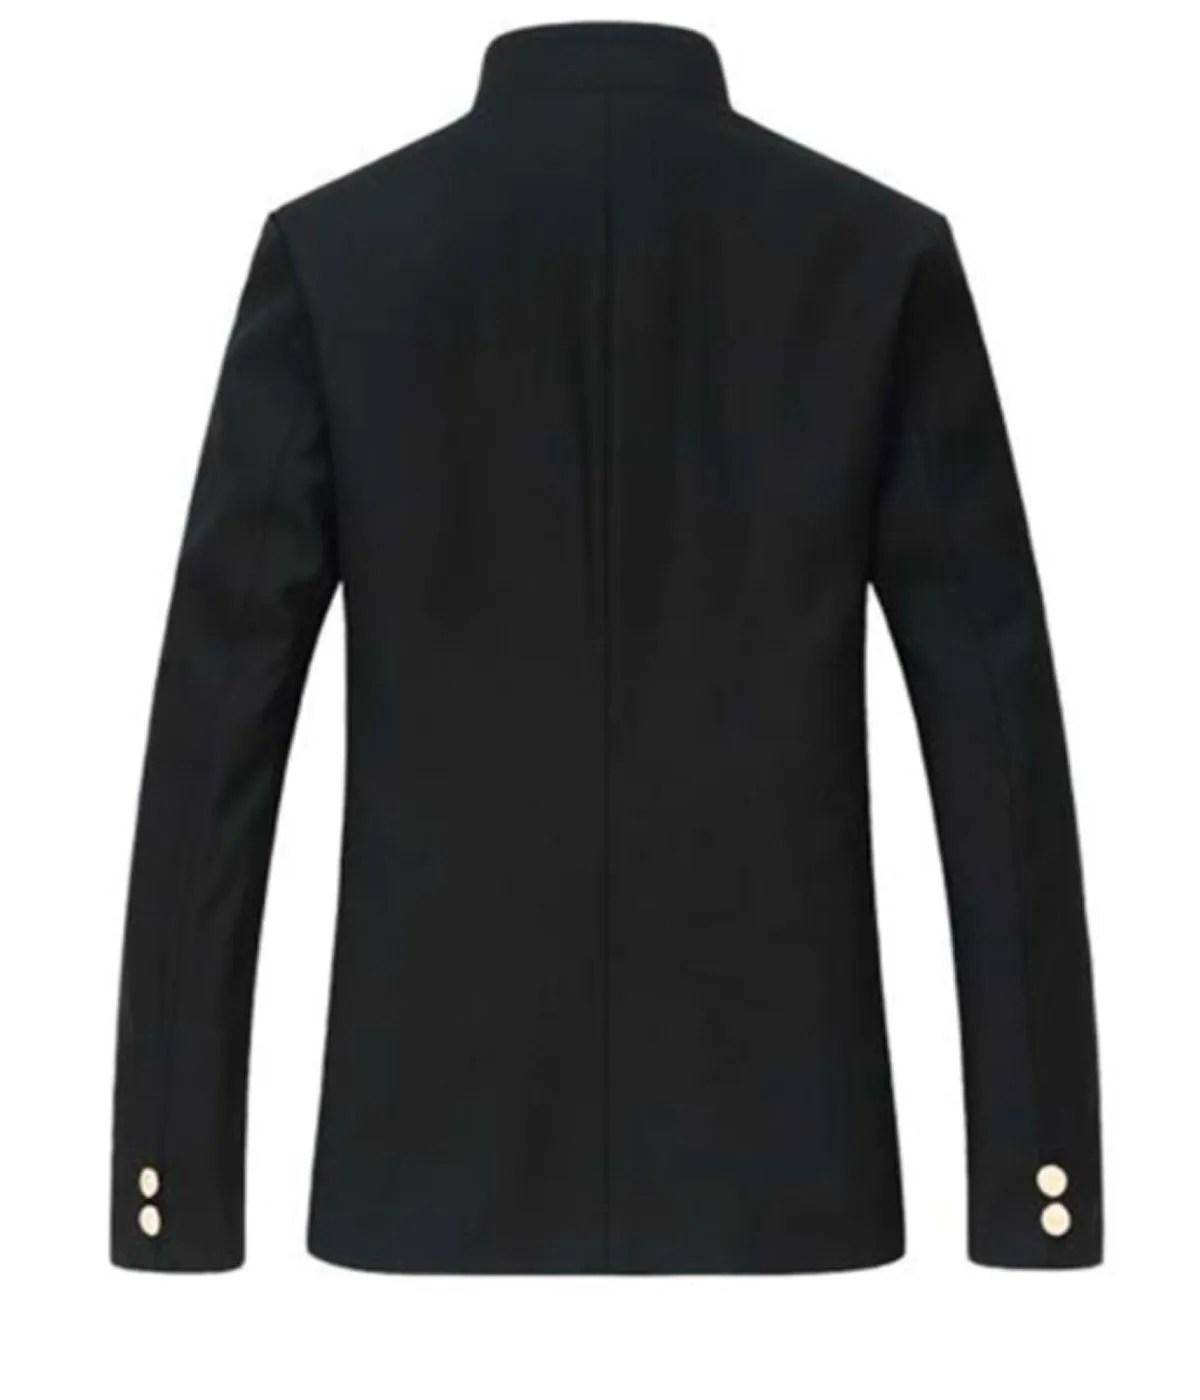 mens-black-slim-fit-tunic-jacket